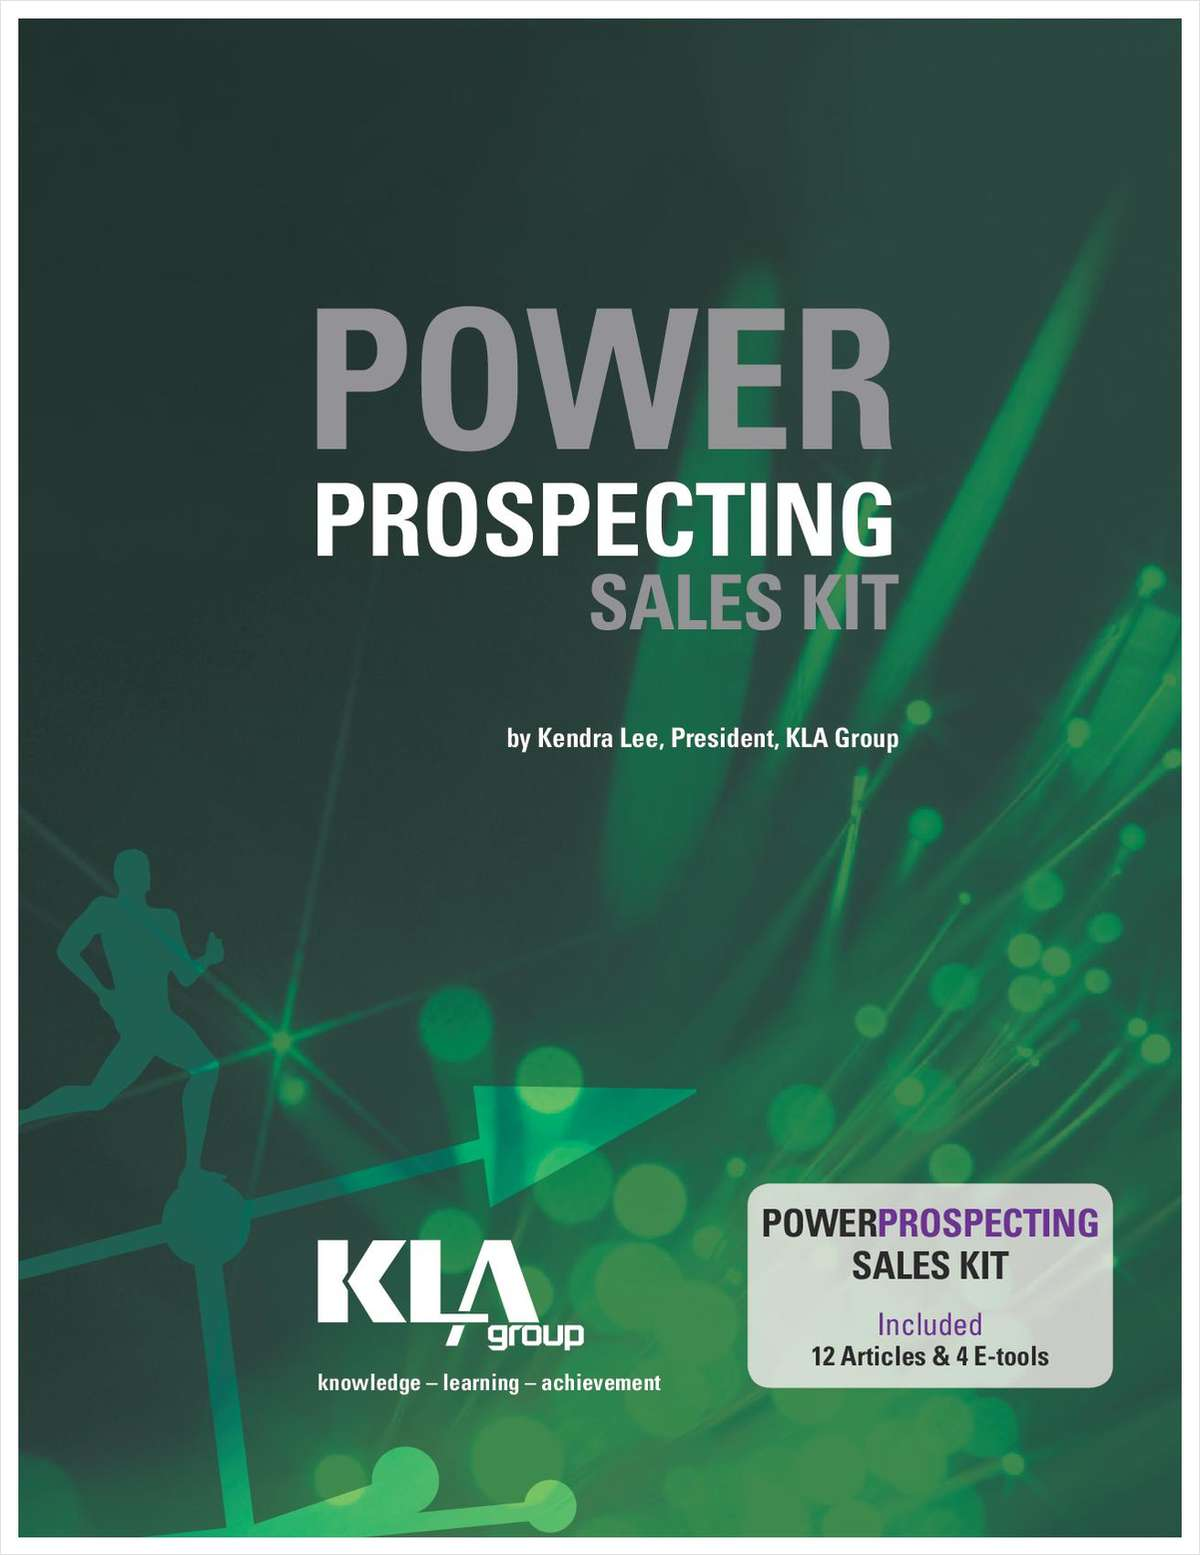 Power Prospecting Sales Kit